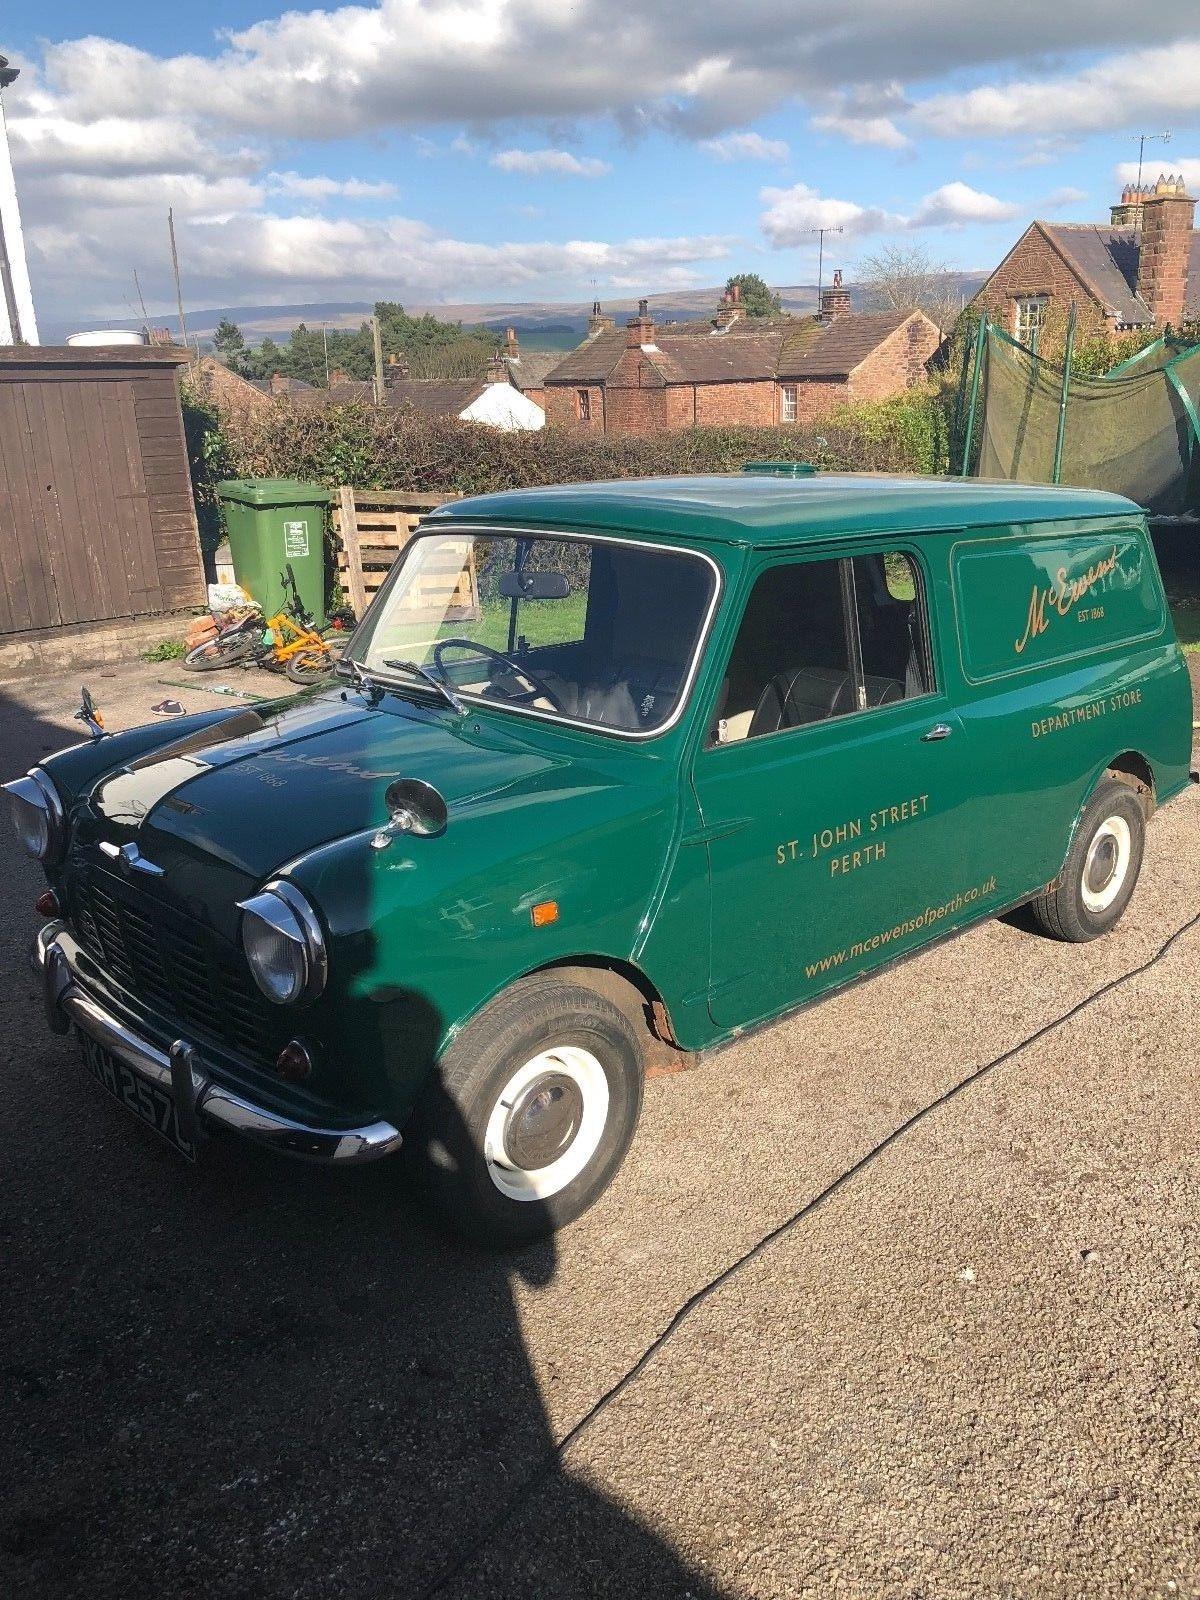 Ebay 1965 Morris Mini Van In Green With Great History Classicmini Mini Mini Van Mini Morris Van